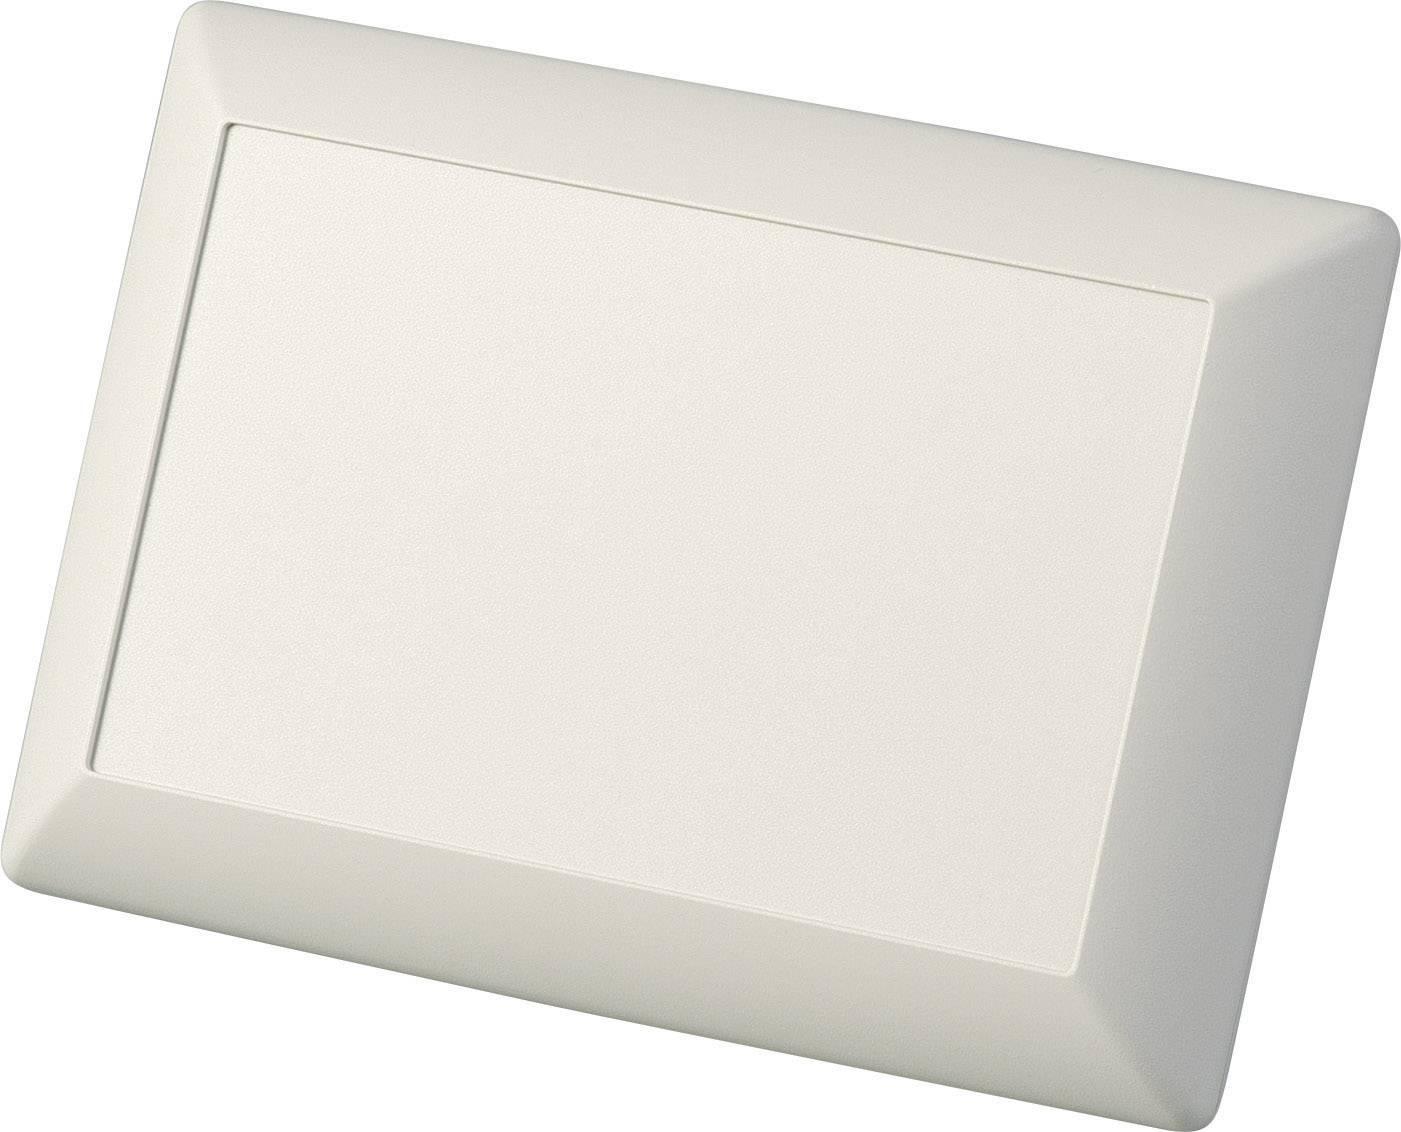 Skrinka na ovládací pult OKW Art-Case D5017607, 160 x 110 x 66 mm, ABS, sivobiela (RAL 9002), 1 sada